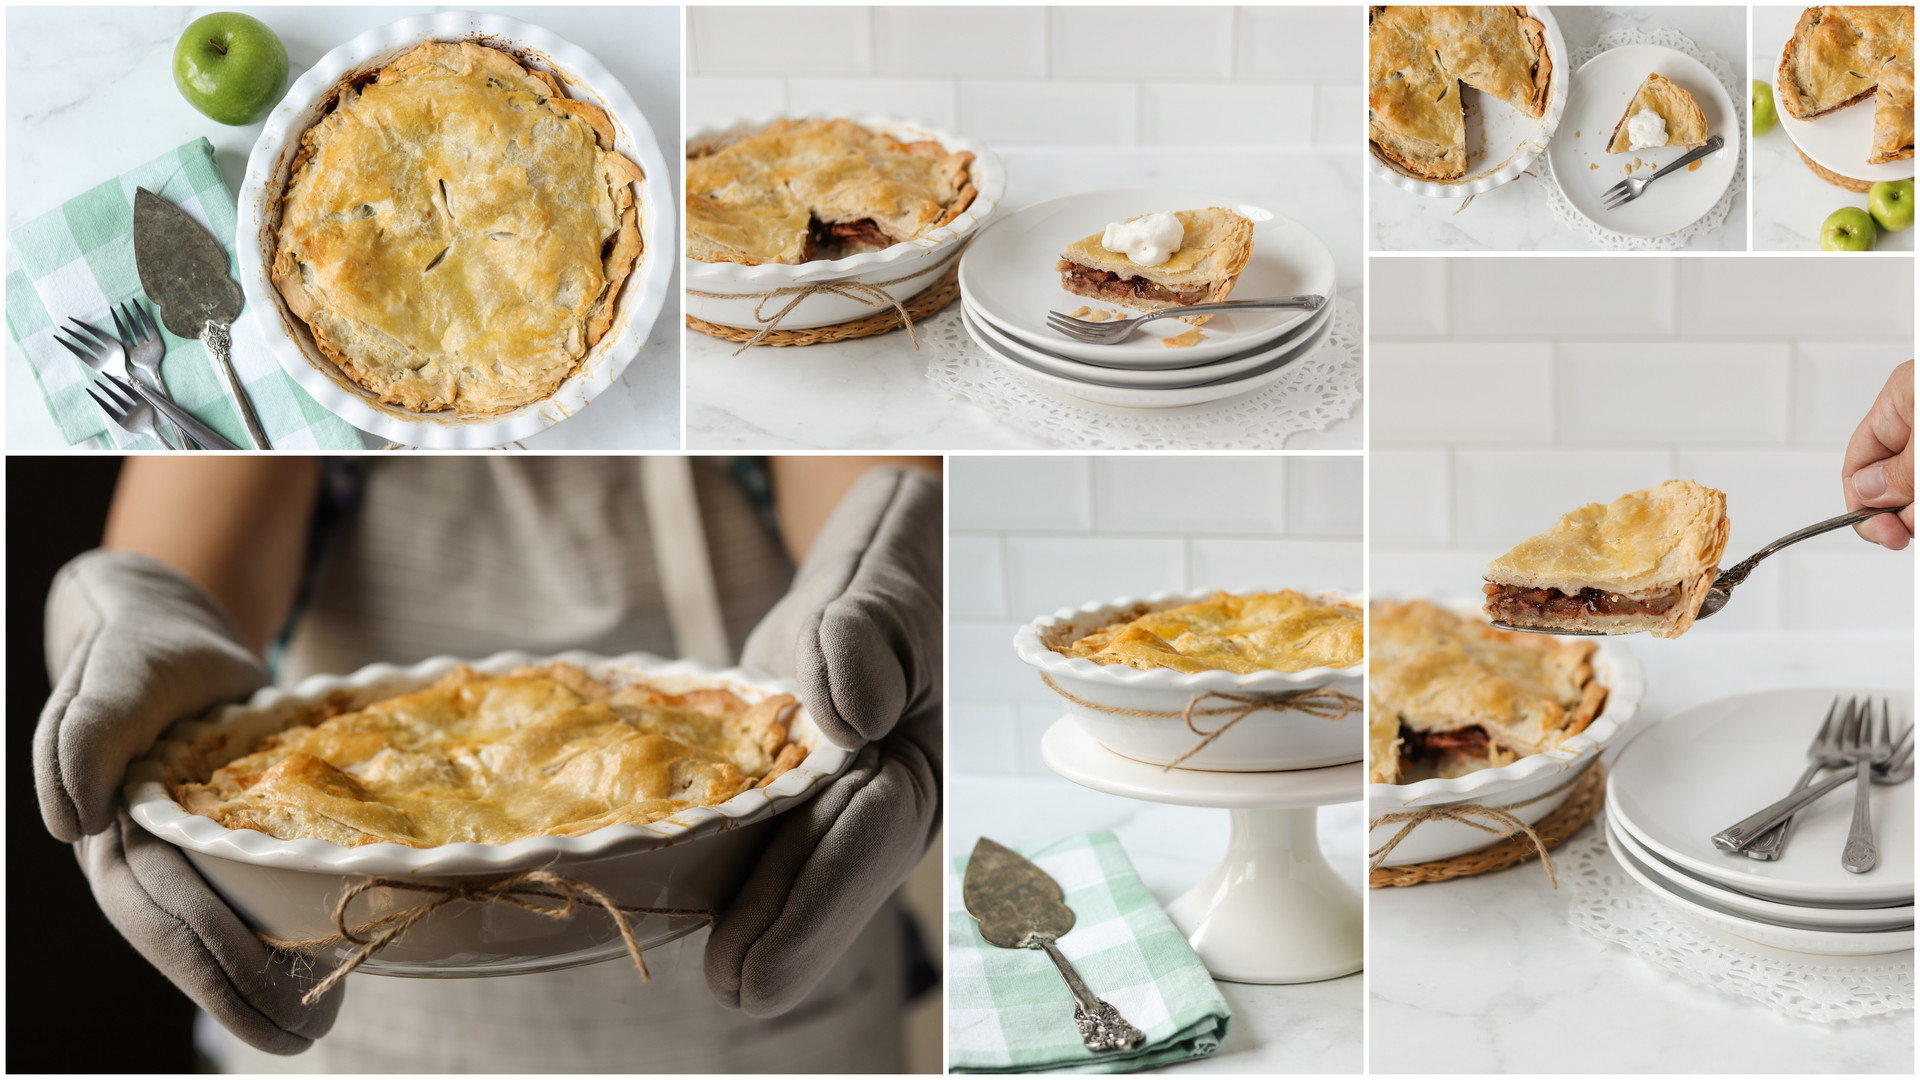 Granny's Apple Pie LR-002.jpg